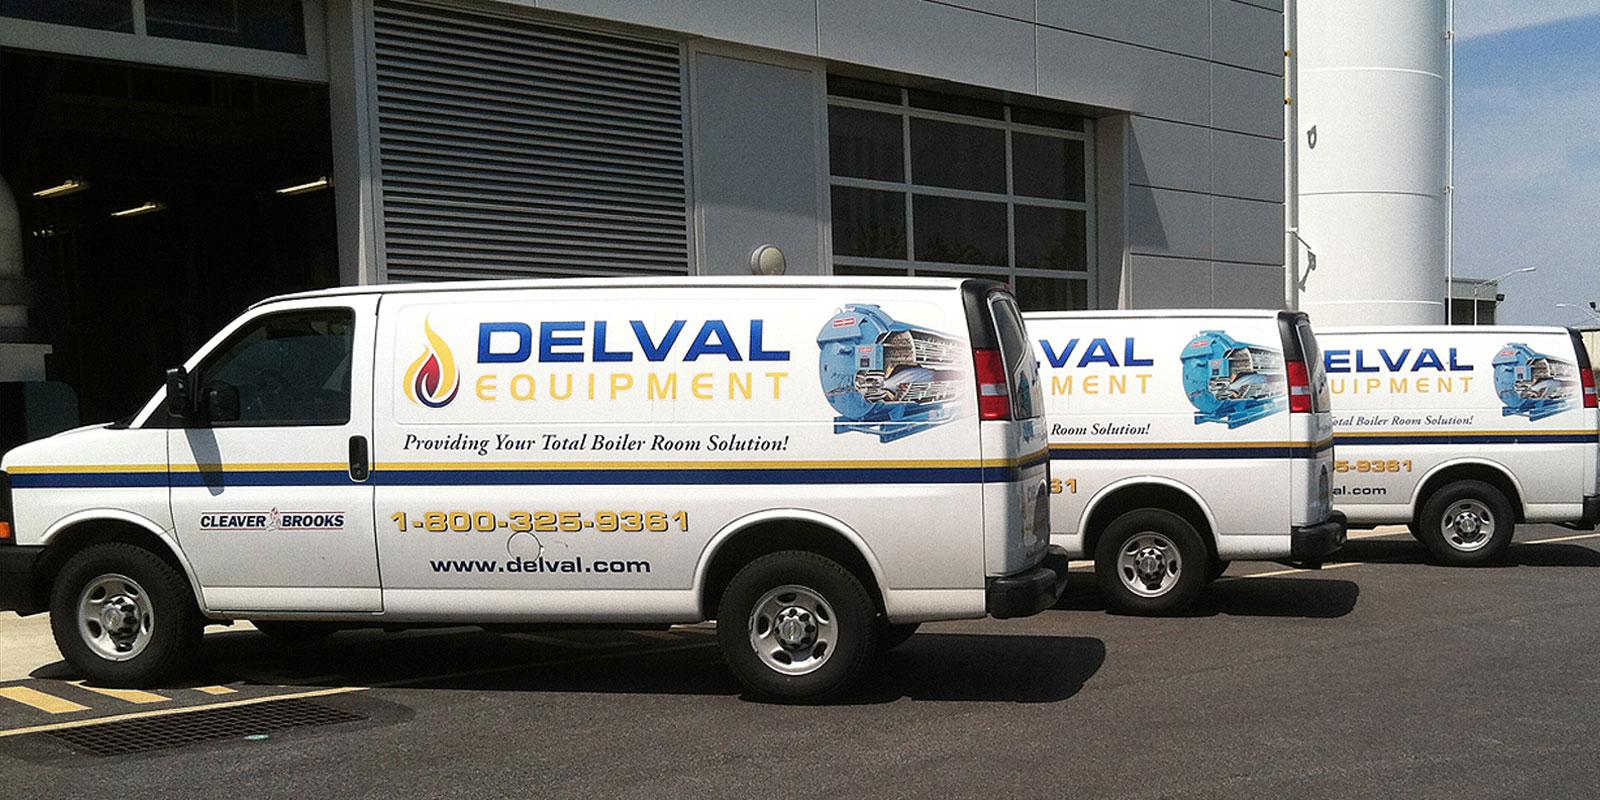 Delval Boiler Service